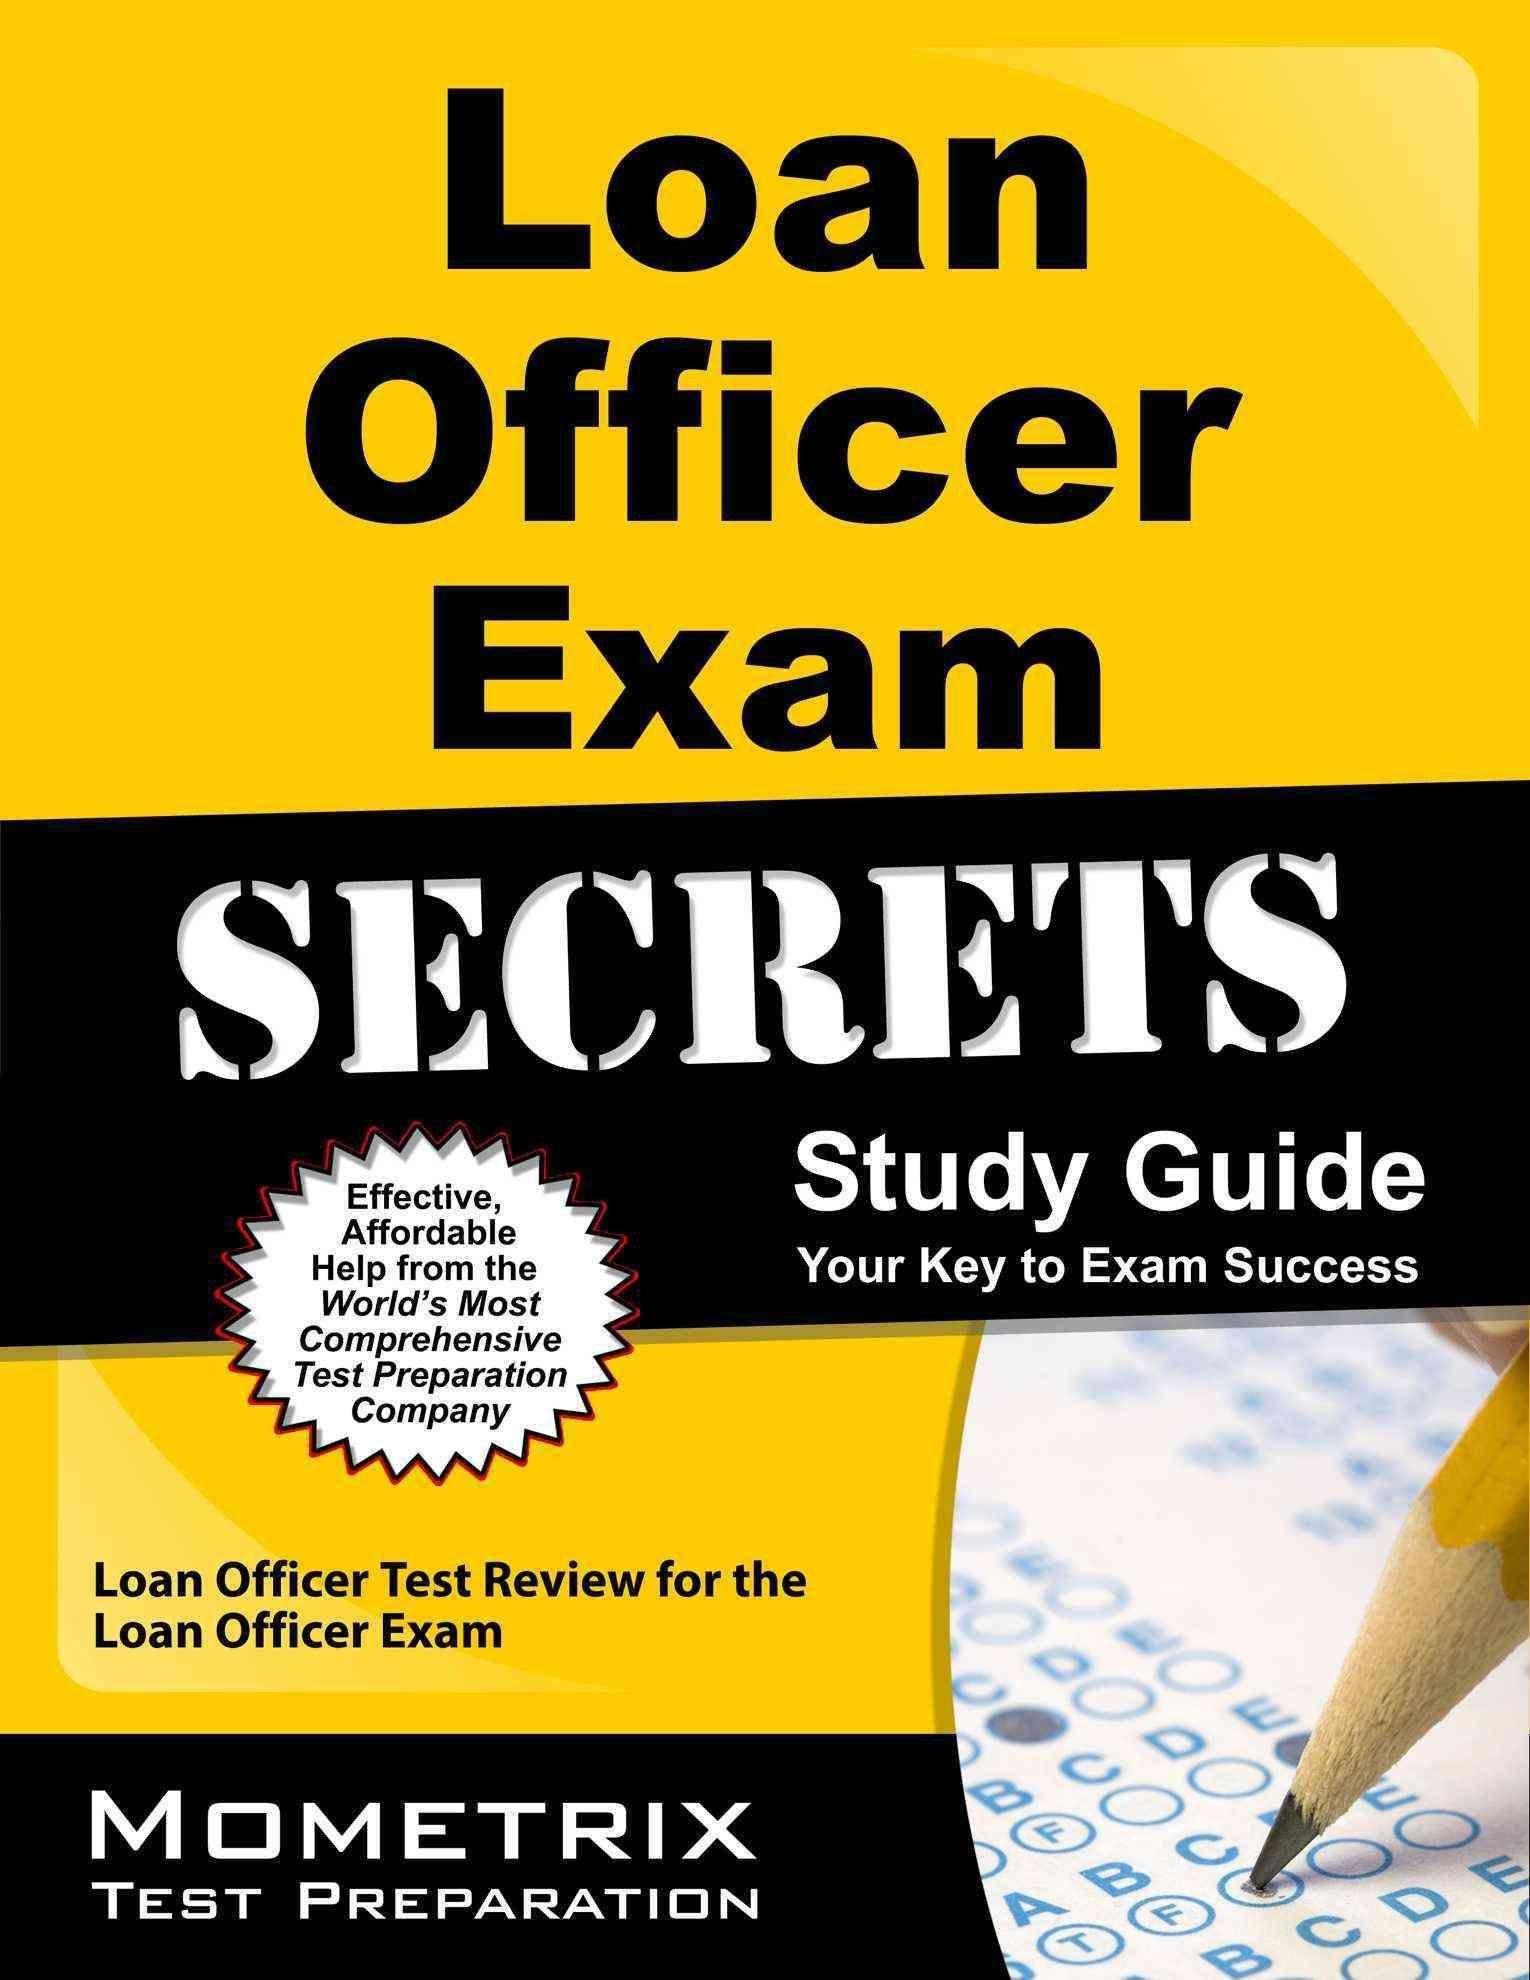 loan officer exam secrets study guide loan officer test review for rh pinterest com Cicerone Exam Study Guide Exam Study Tips